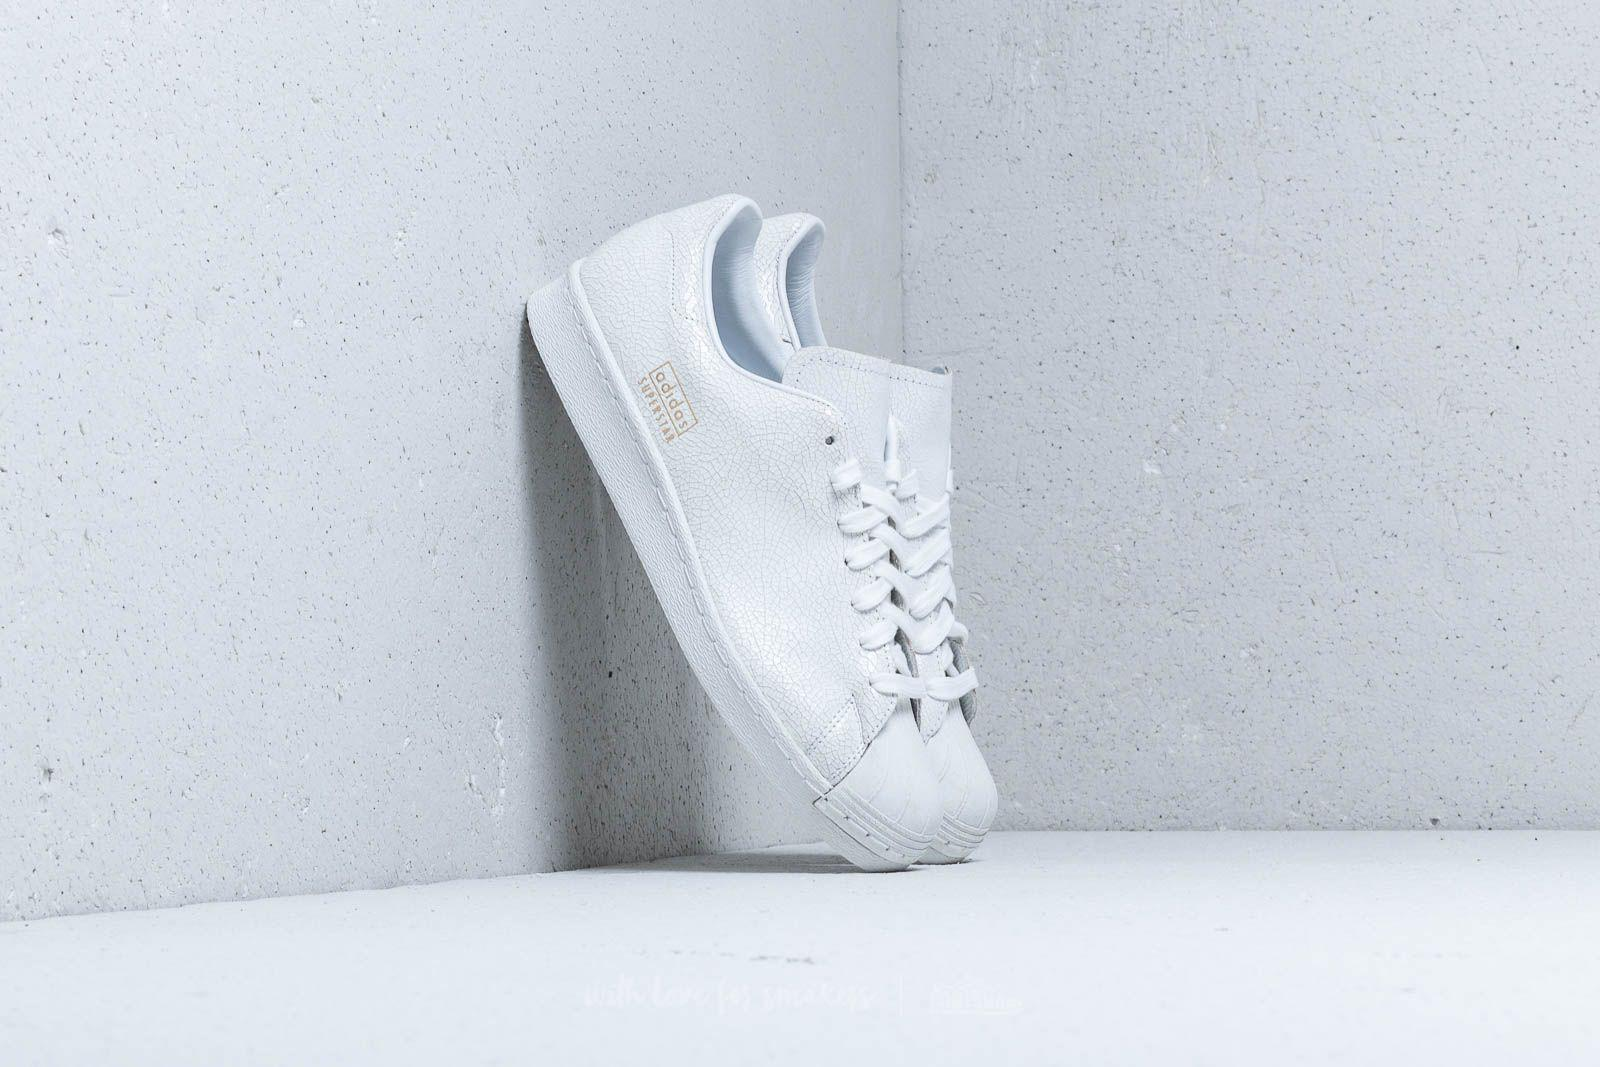 first rate da686 b9cf4 Lyst - adidas Originals Adidas Superstar 80s Clean Ftw White